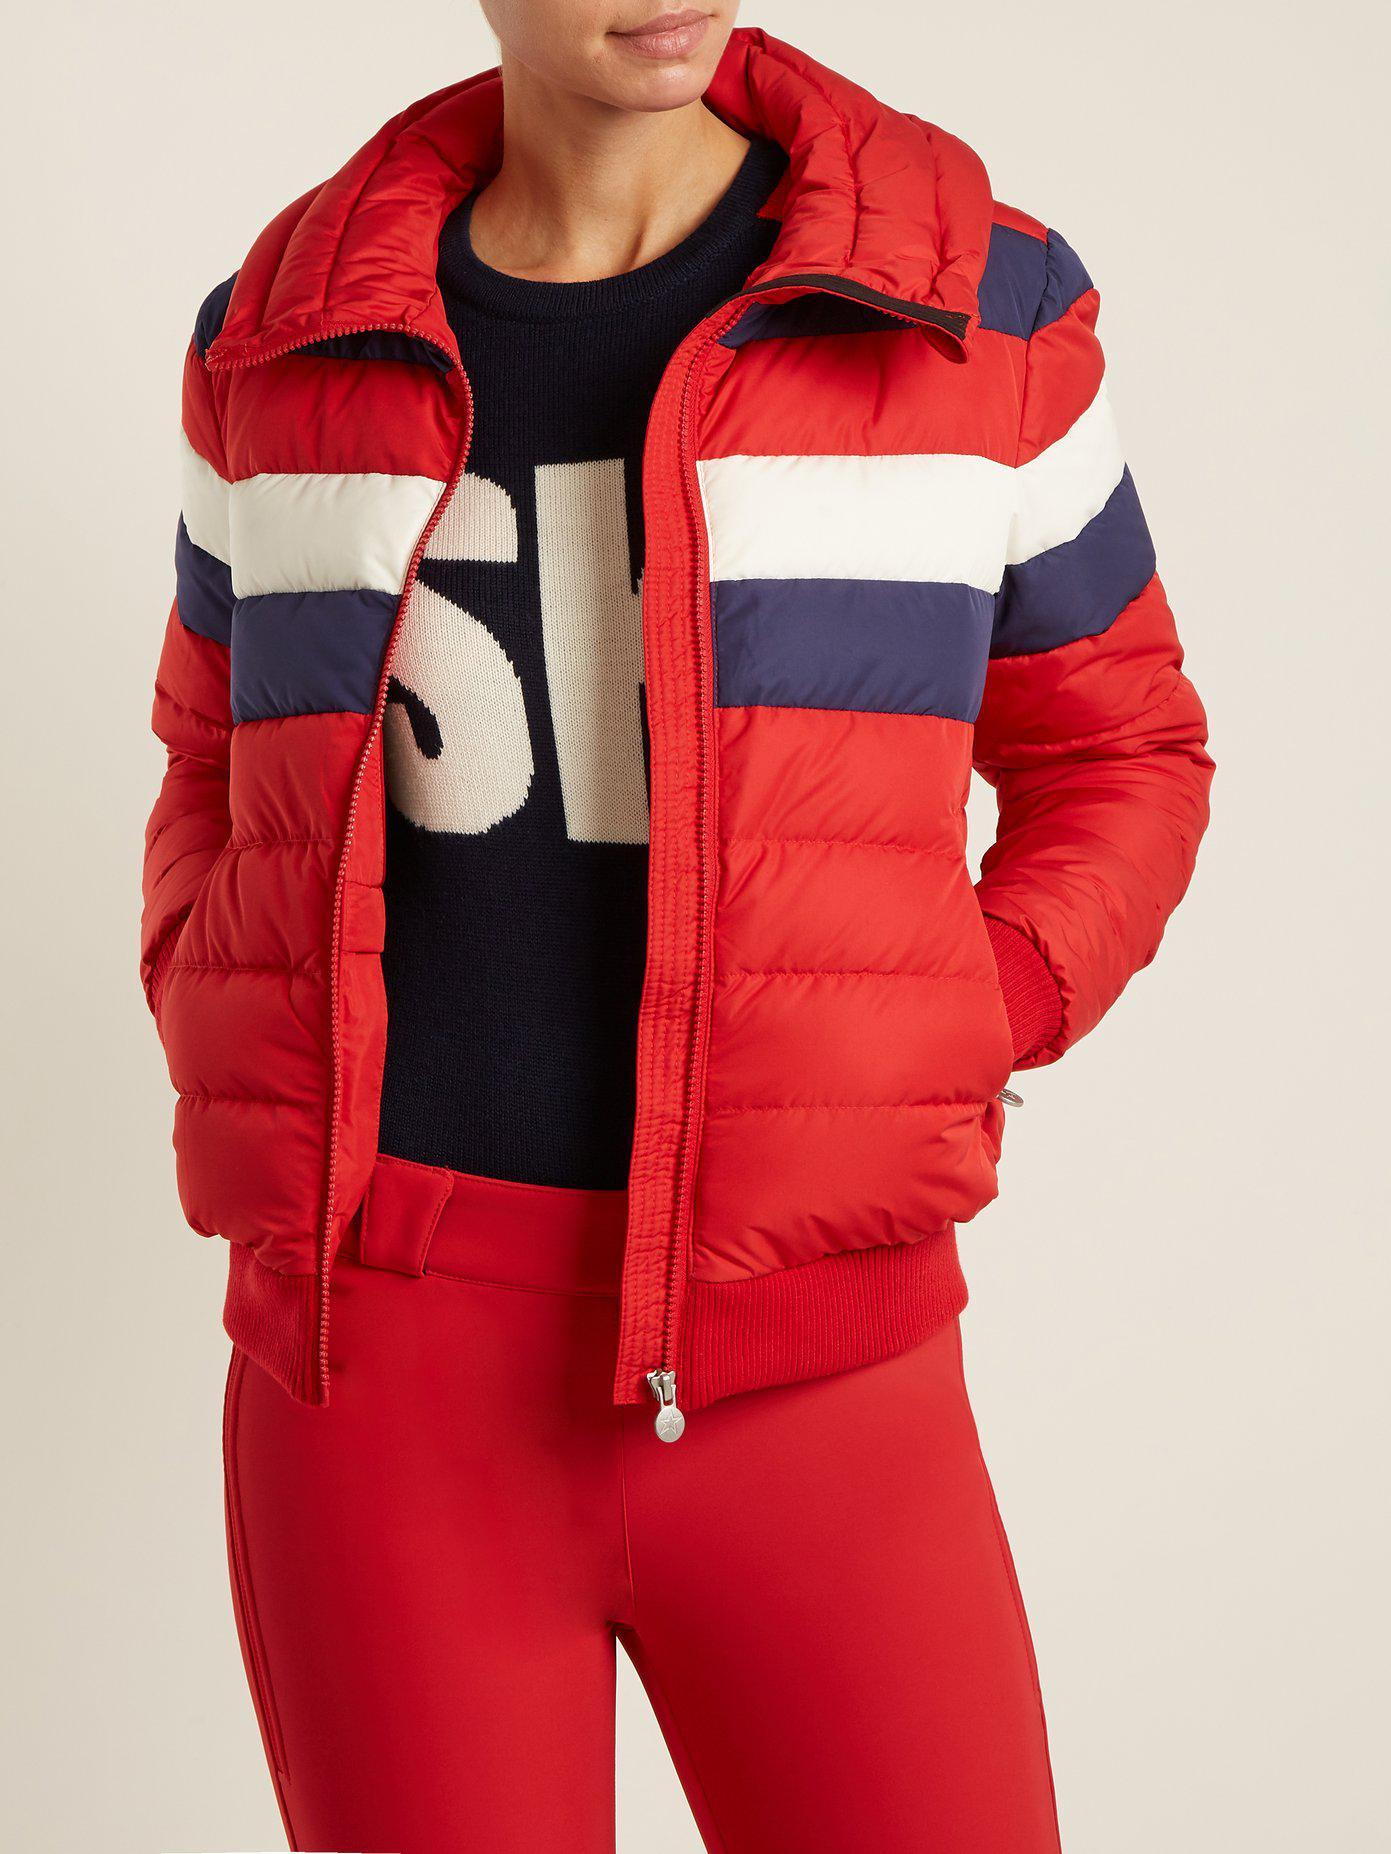 Ski Moment Doudoune Perfect De Veste Queenie Rgqn0X5